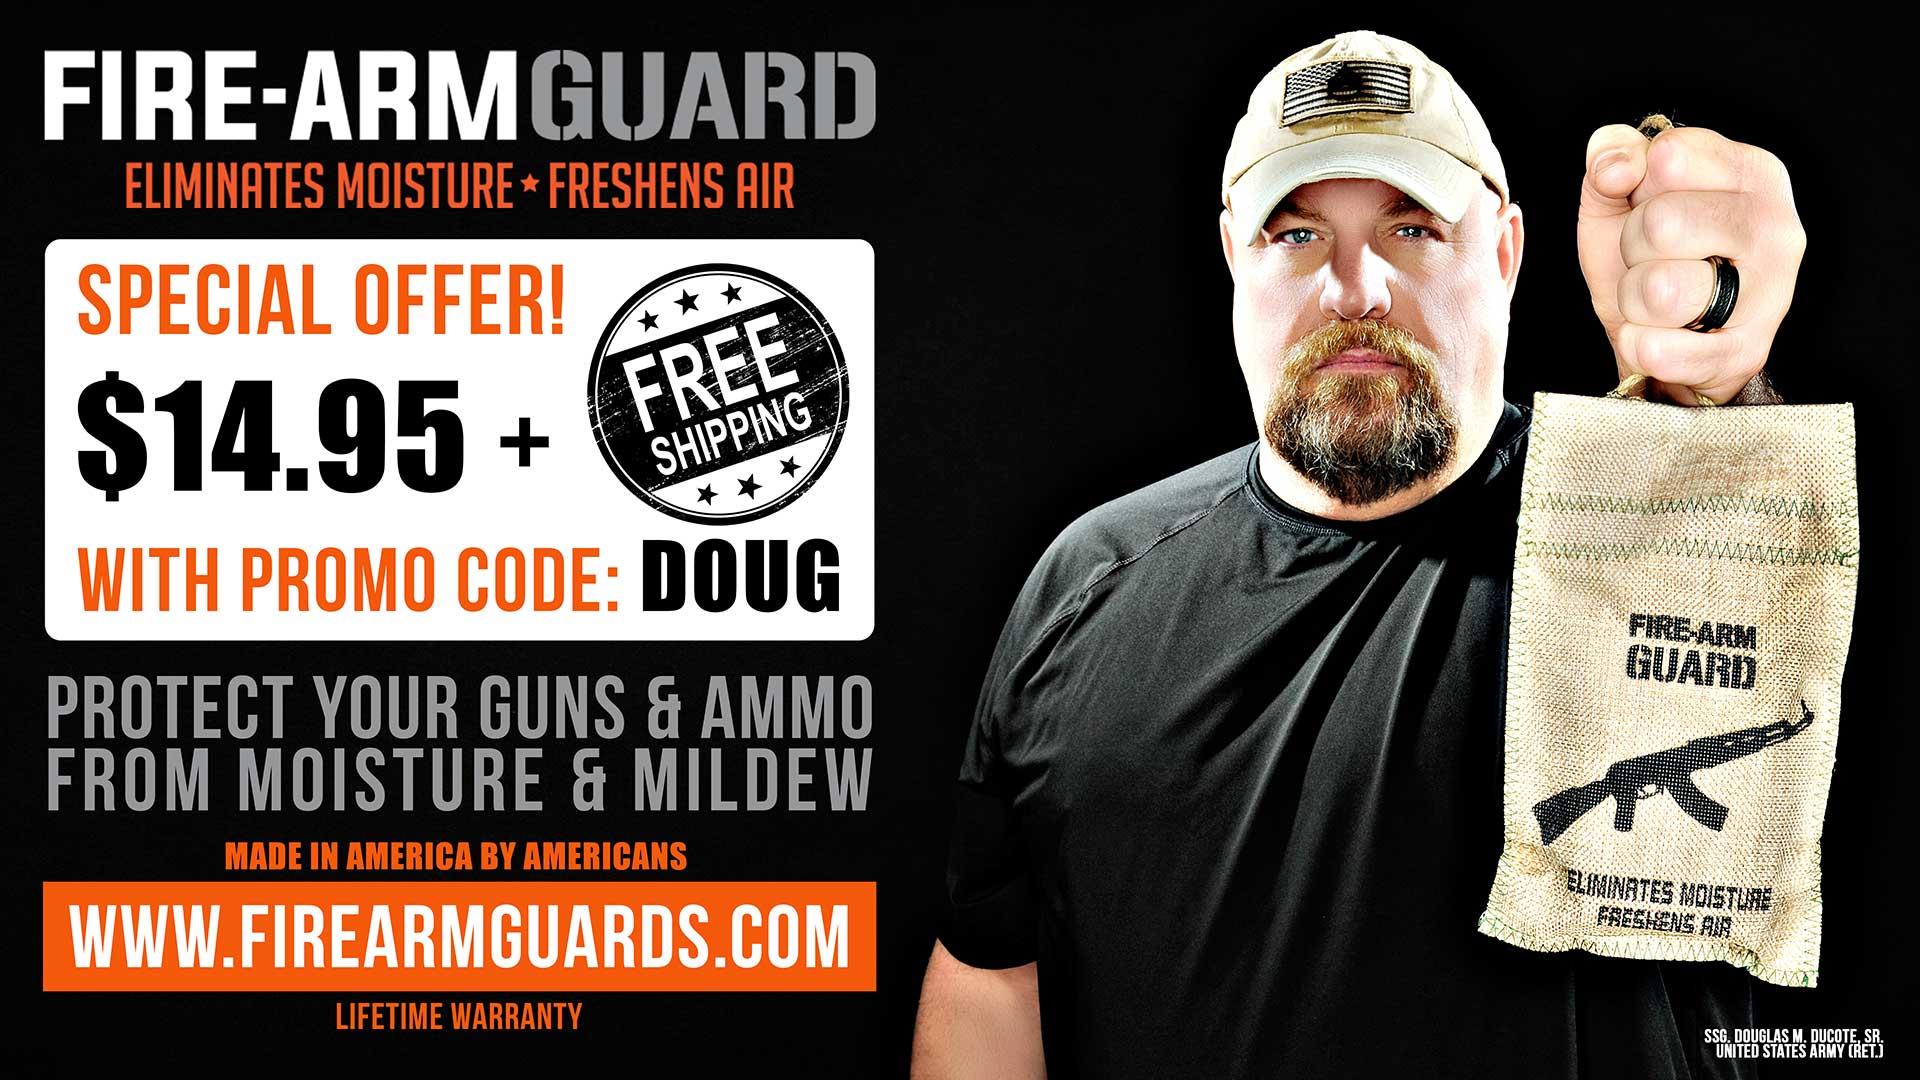 FireArmGuards-Promo-Code-Doug